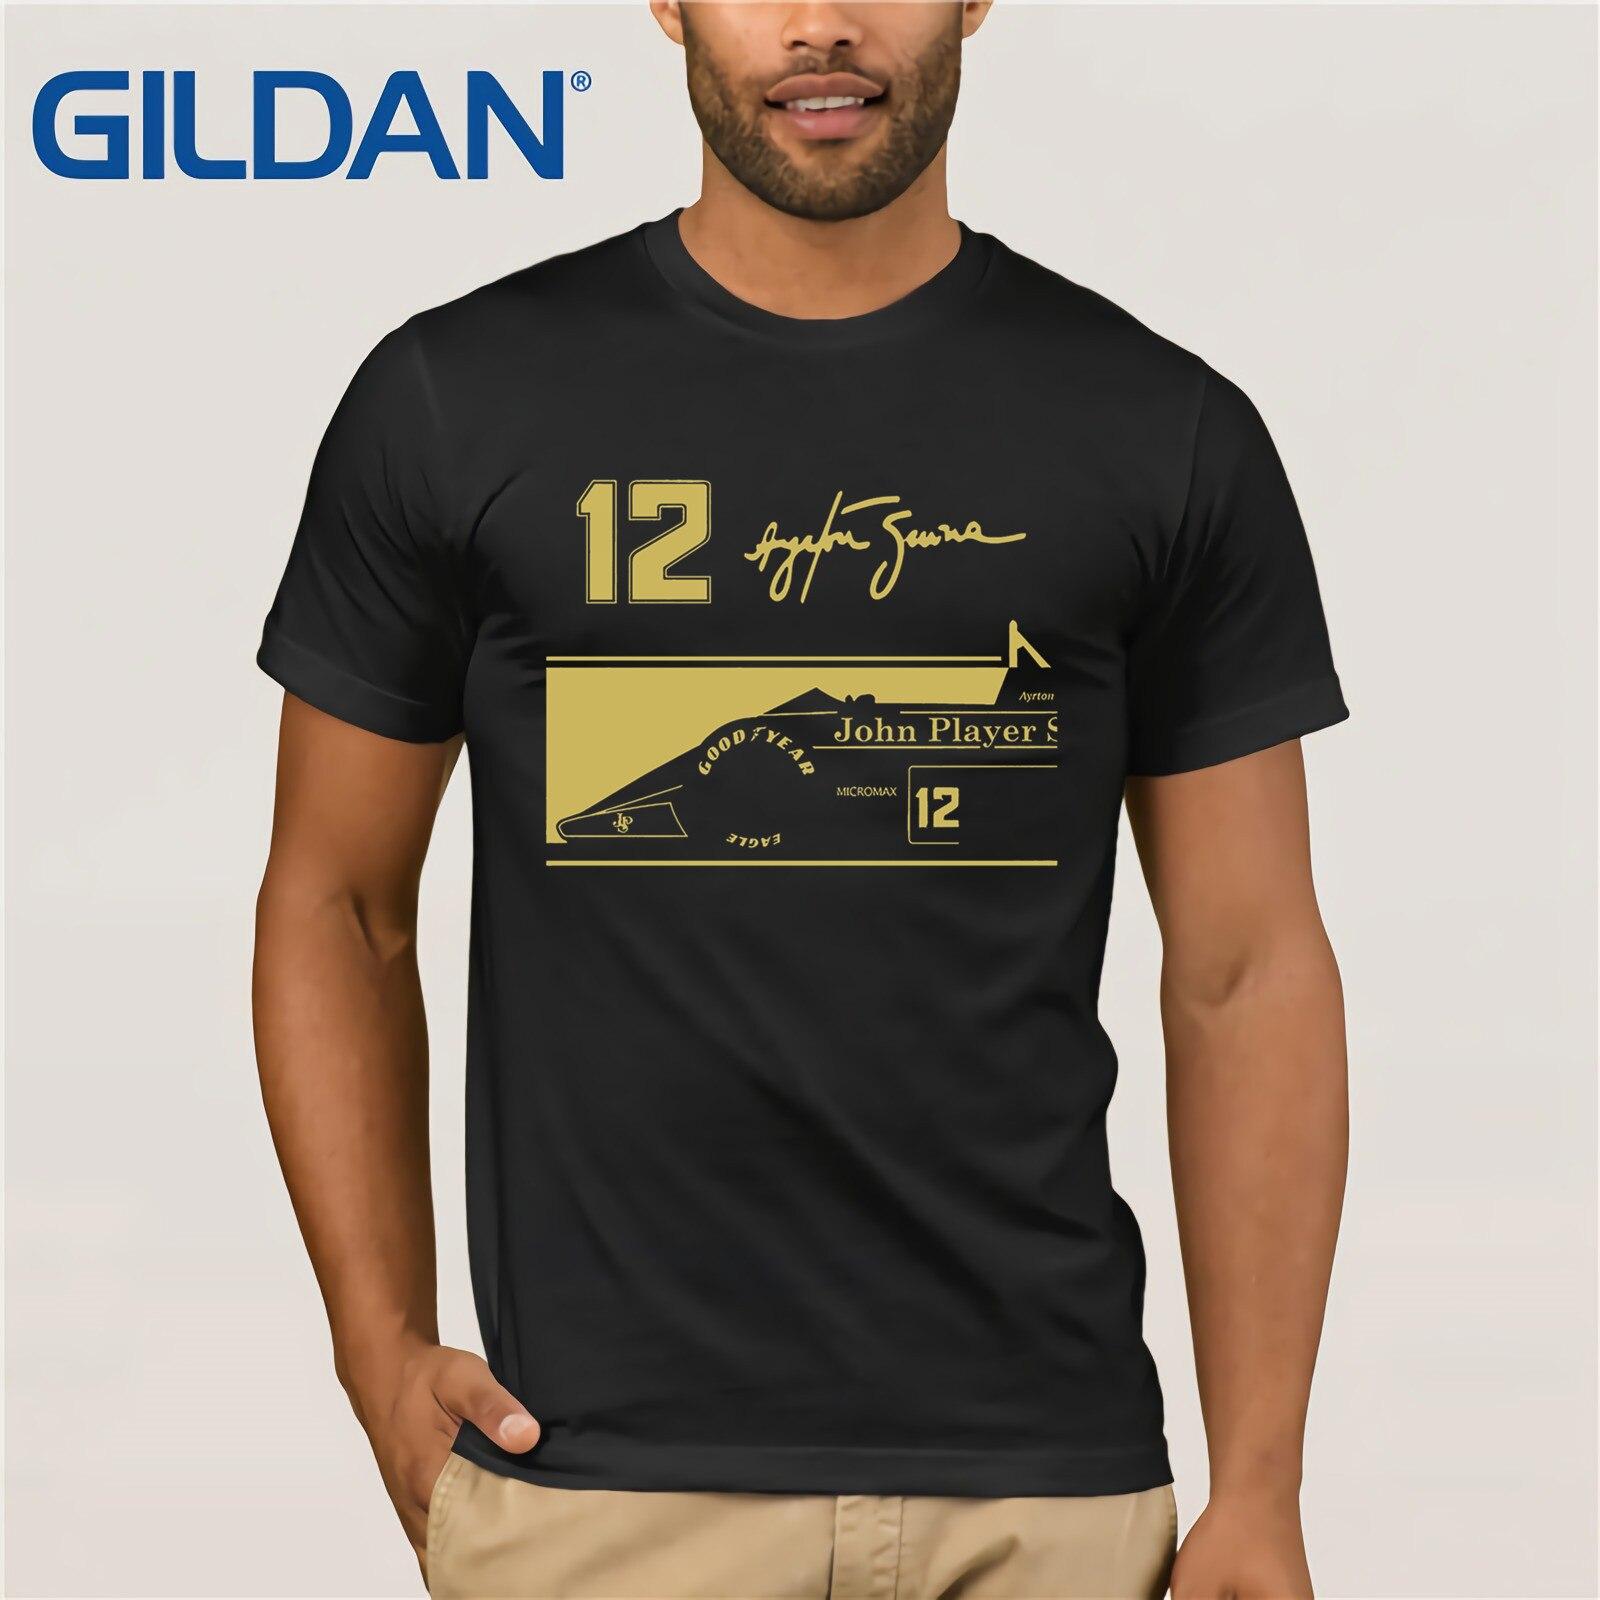 2019-new-fashion-casual-men-t-shirt-novelty-o-neck-tops-ayrton-font-b-senna-b-font-jps-tribute-t-shirt-12-signature-bulk-t-shirts